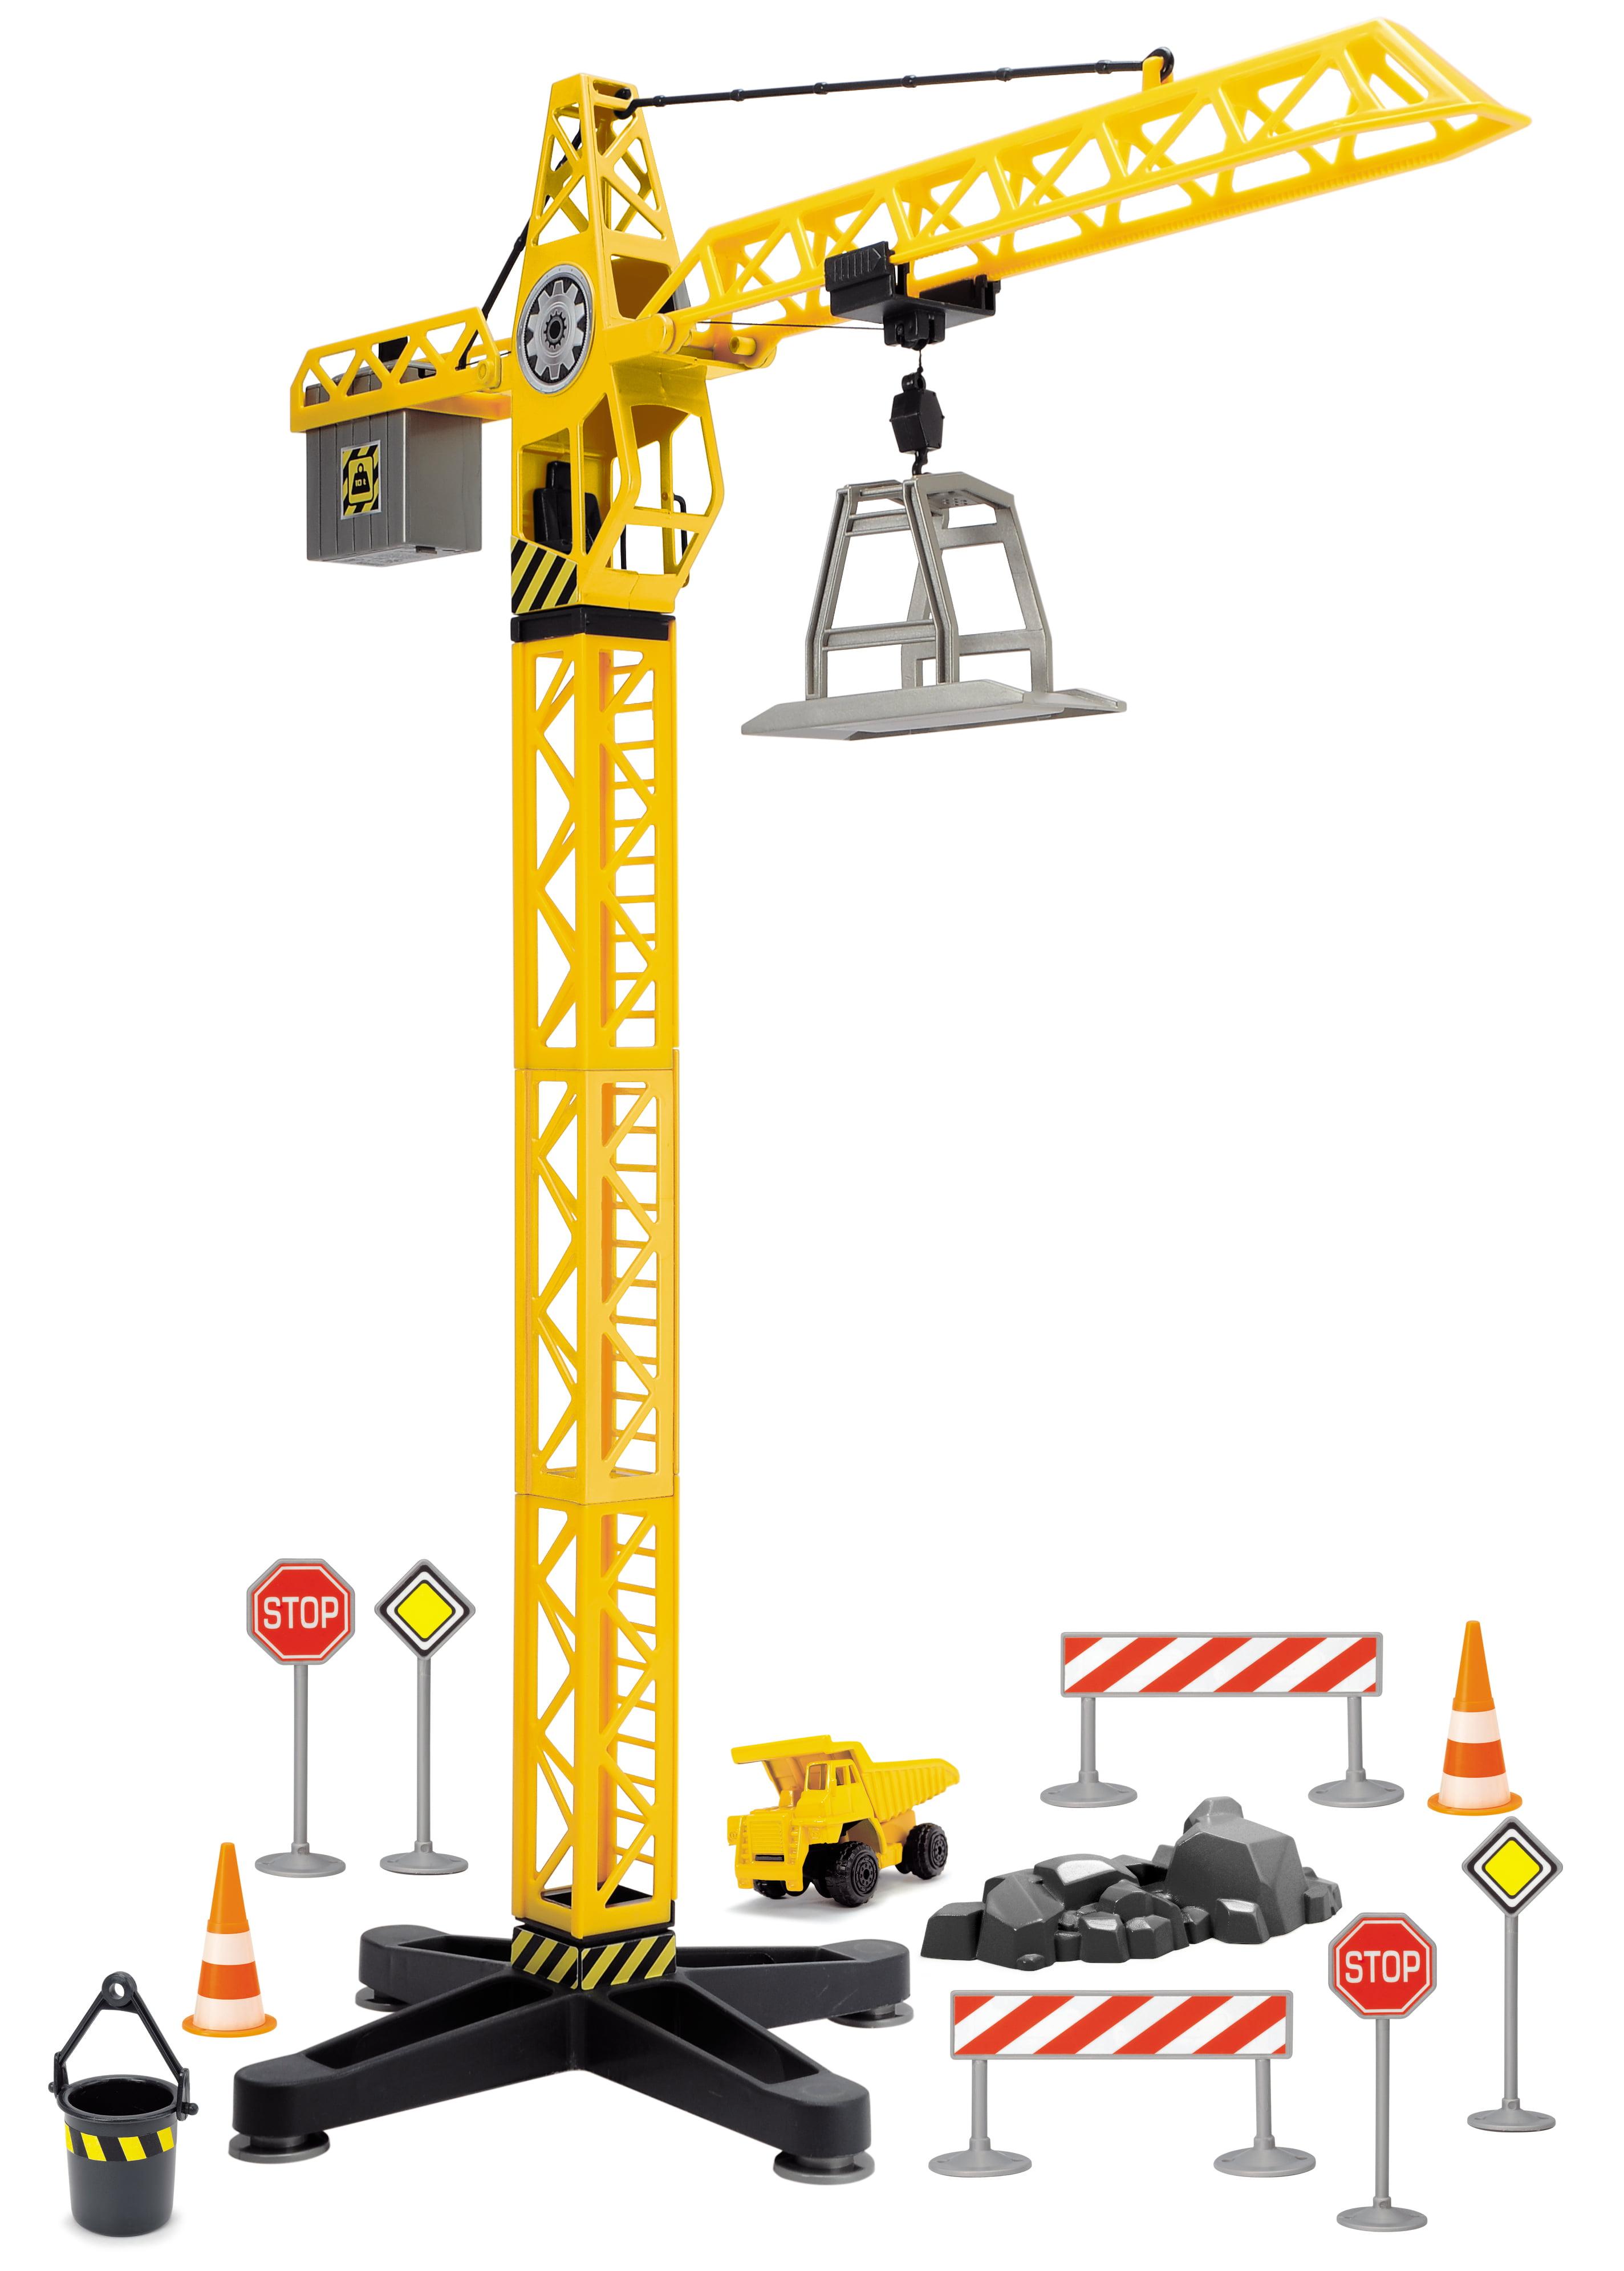 Adventure force light and sound crane set